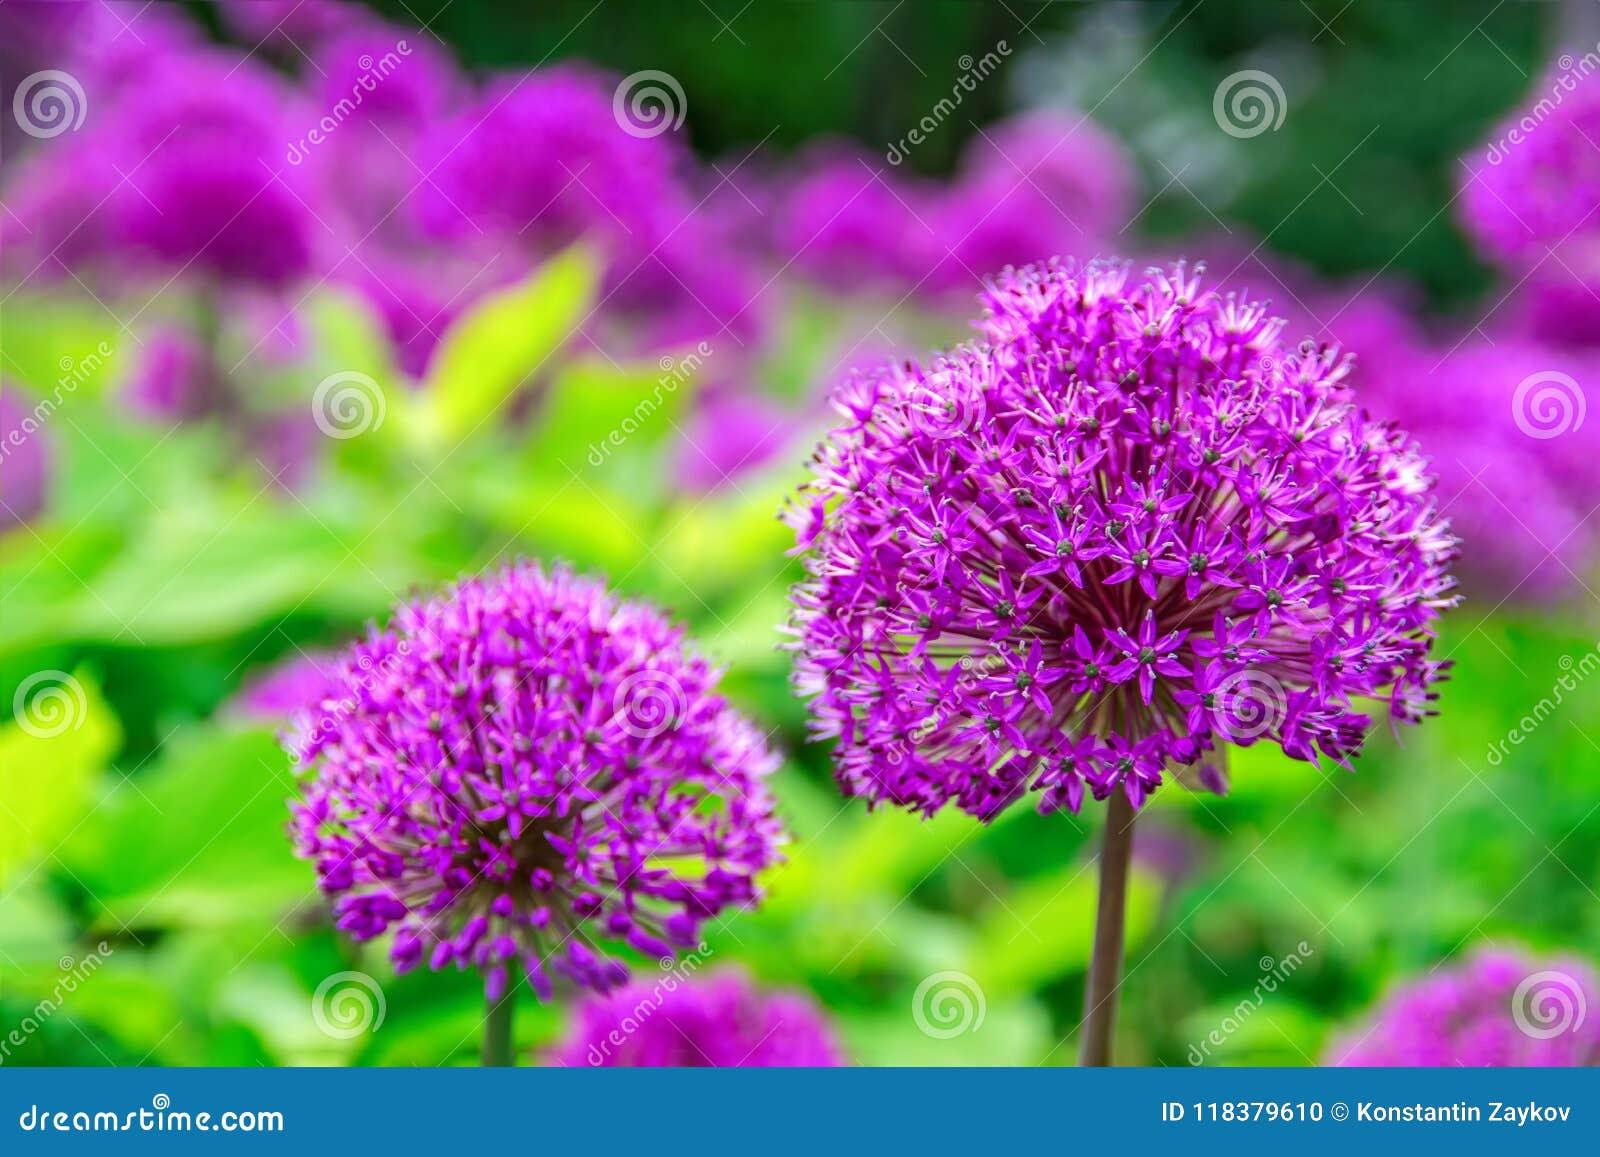 Beautiful flowers of onion allium purple colour garden nature download beautiful flowers of onion allium purple colour garden nature spring globe izmirmasajfo